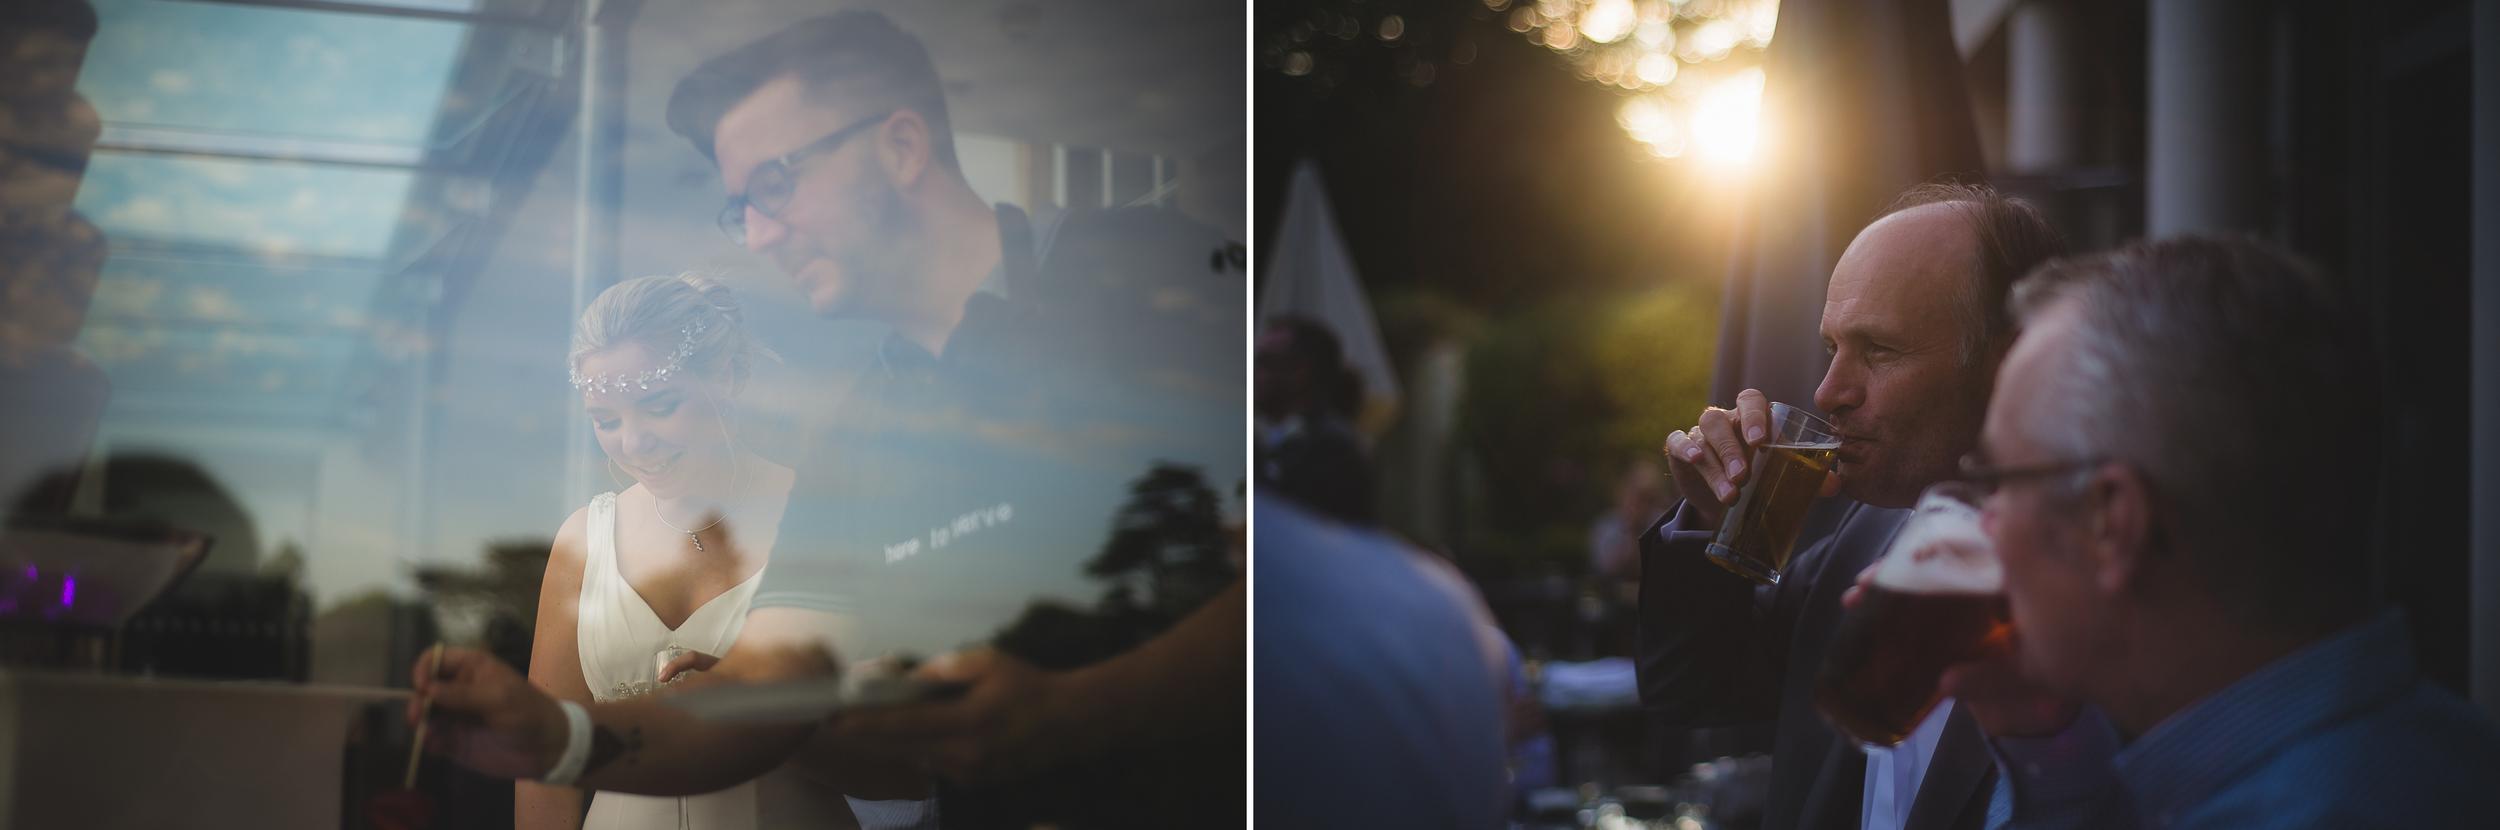 golden hour light wedding photography